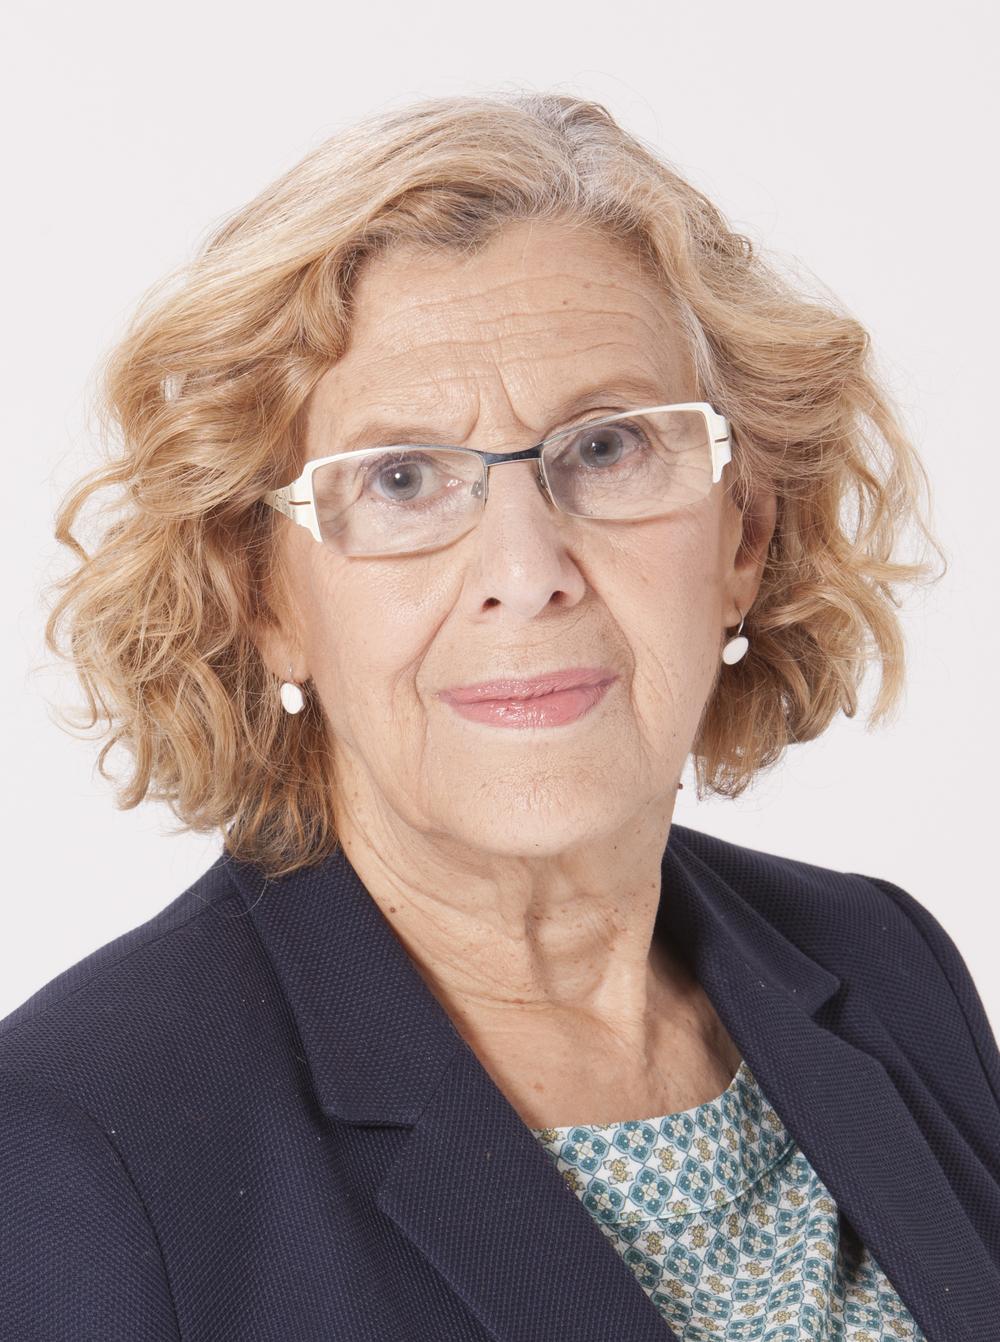 Madrid Mayor Manuela Carmena. Credit: Ahora Madrid, David Arenal via Wikimedia Commons.